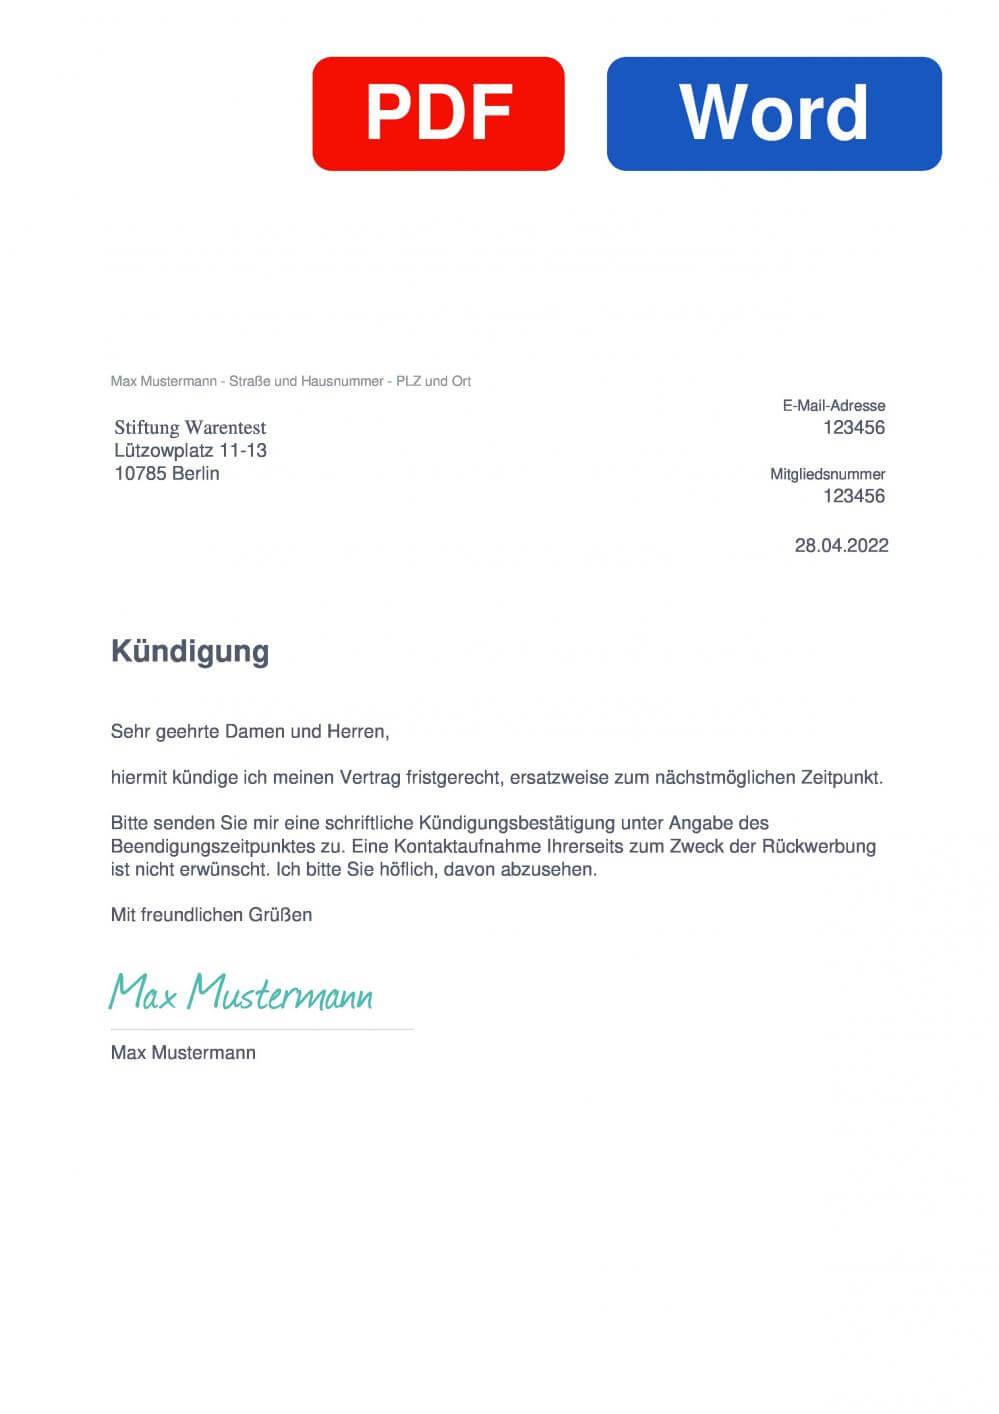 Stiftung Warentest Probeabo KГјndigen